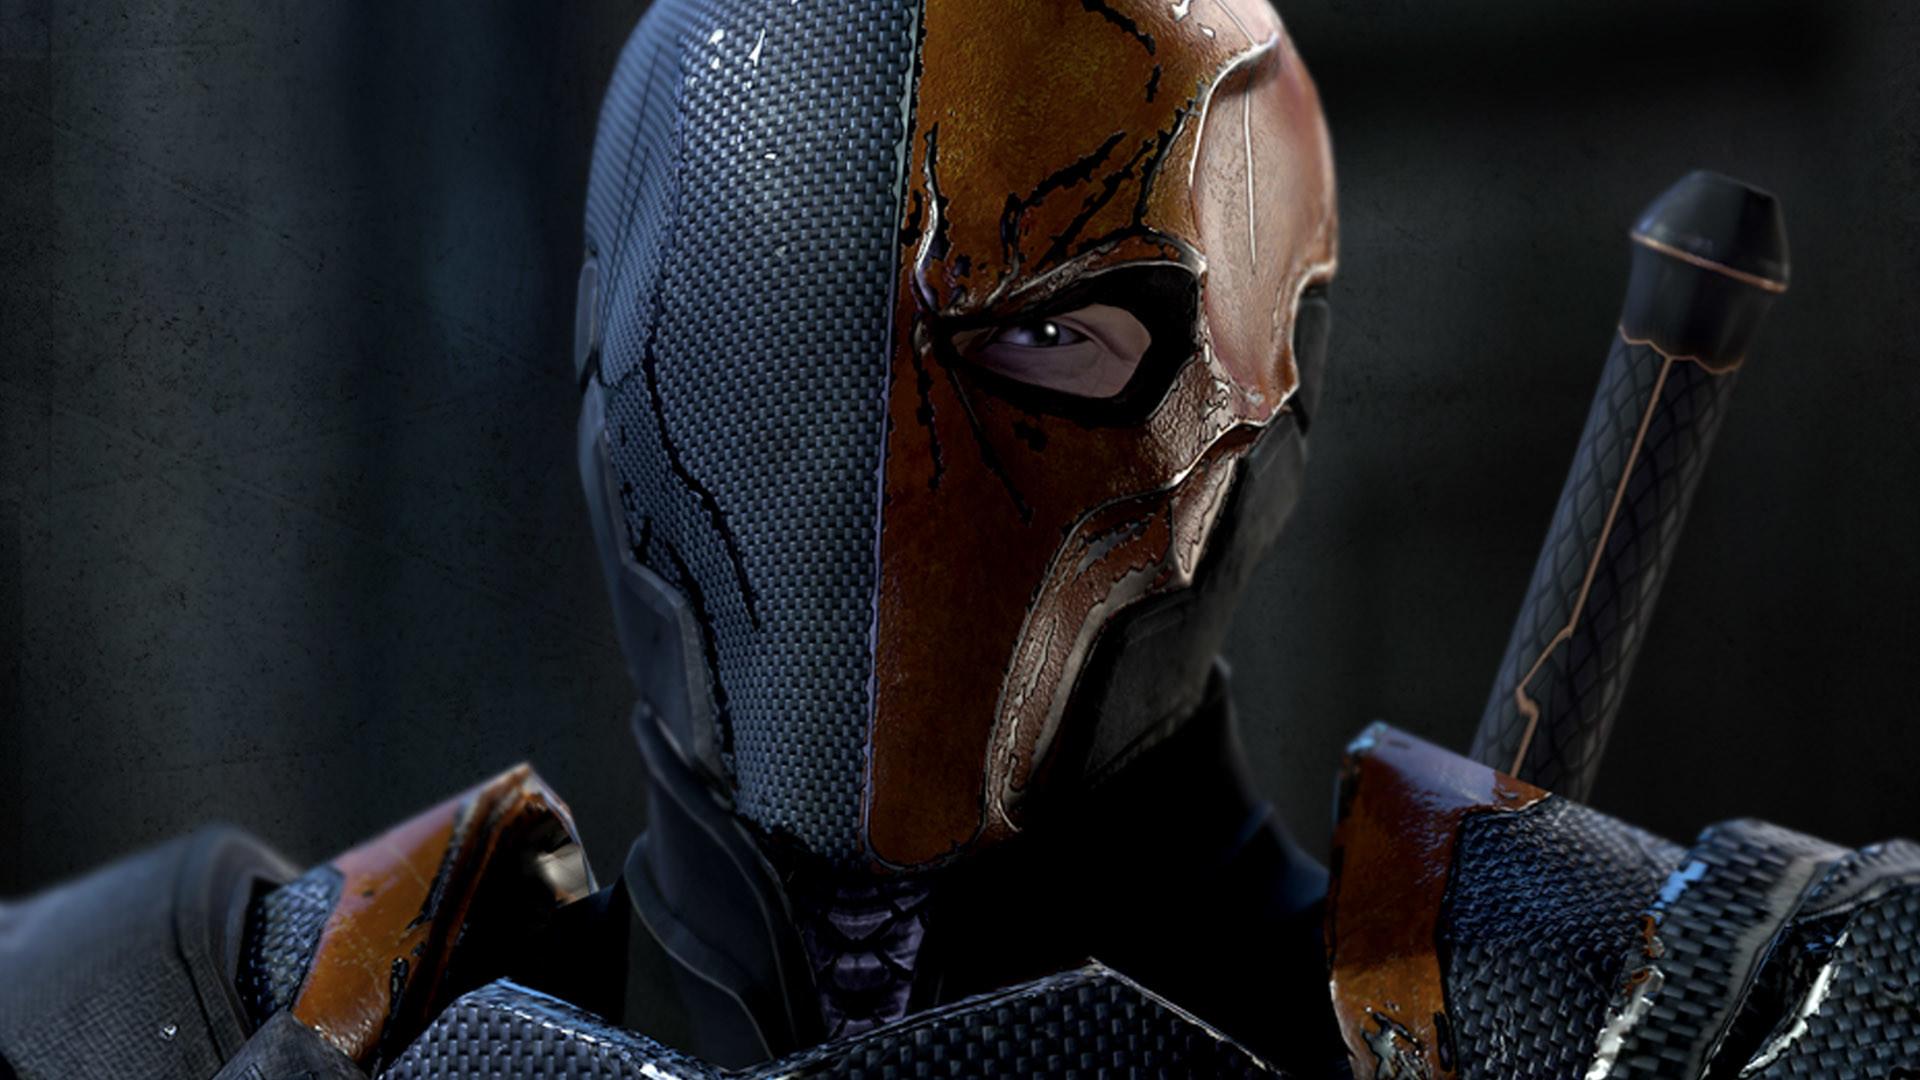 .wikia.com/wiki/Batman:_Arkham_Origins_-_Deathstroke?